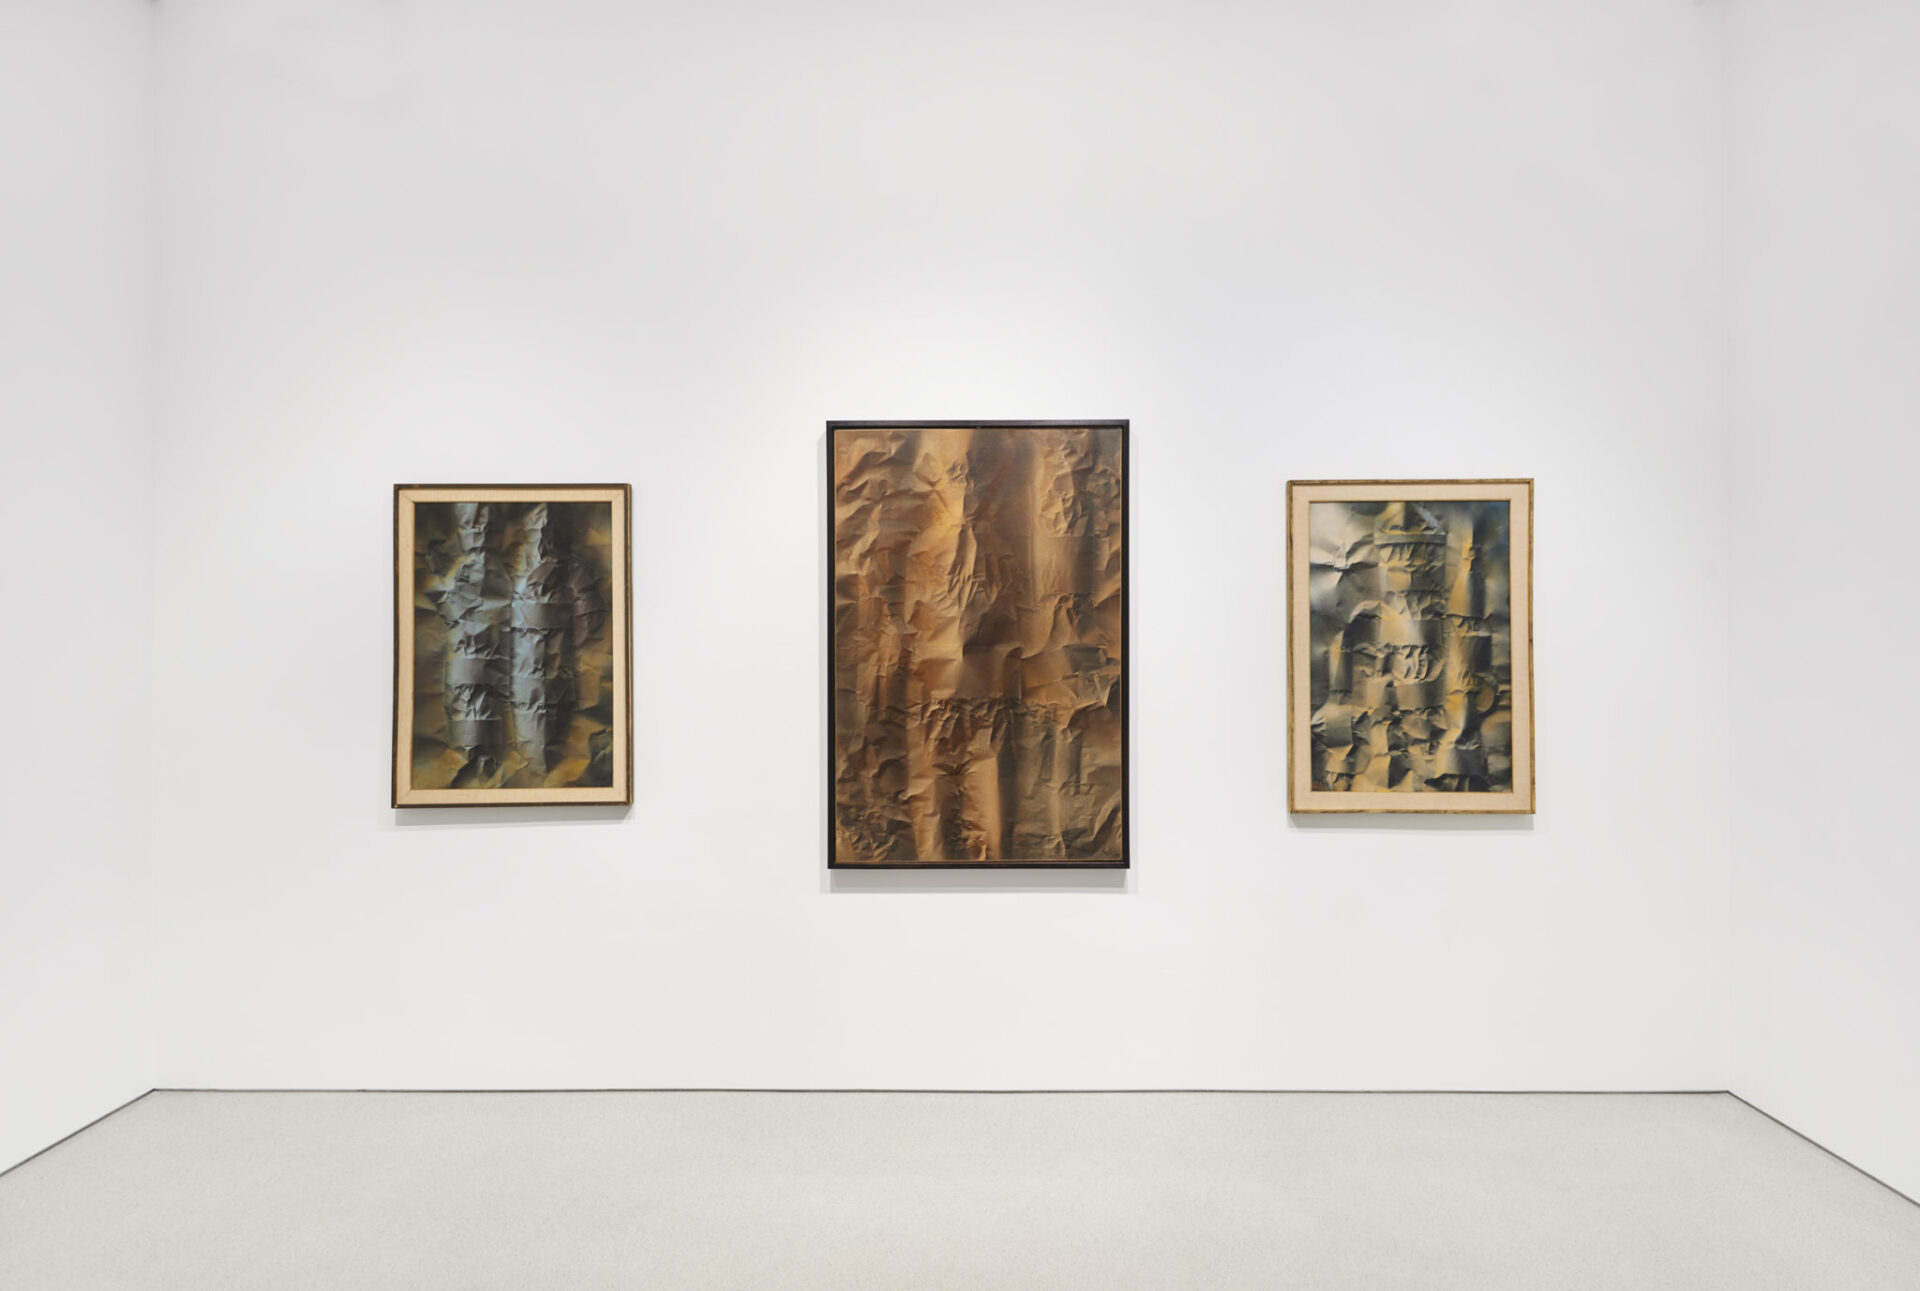 Corrado Cagli's paintings, Courtesy Sperone Westwater, New York